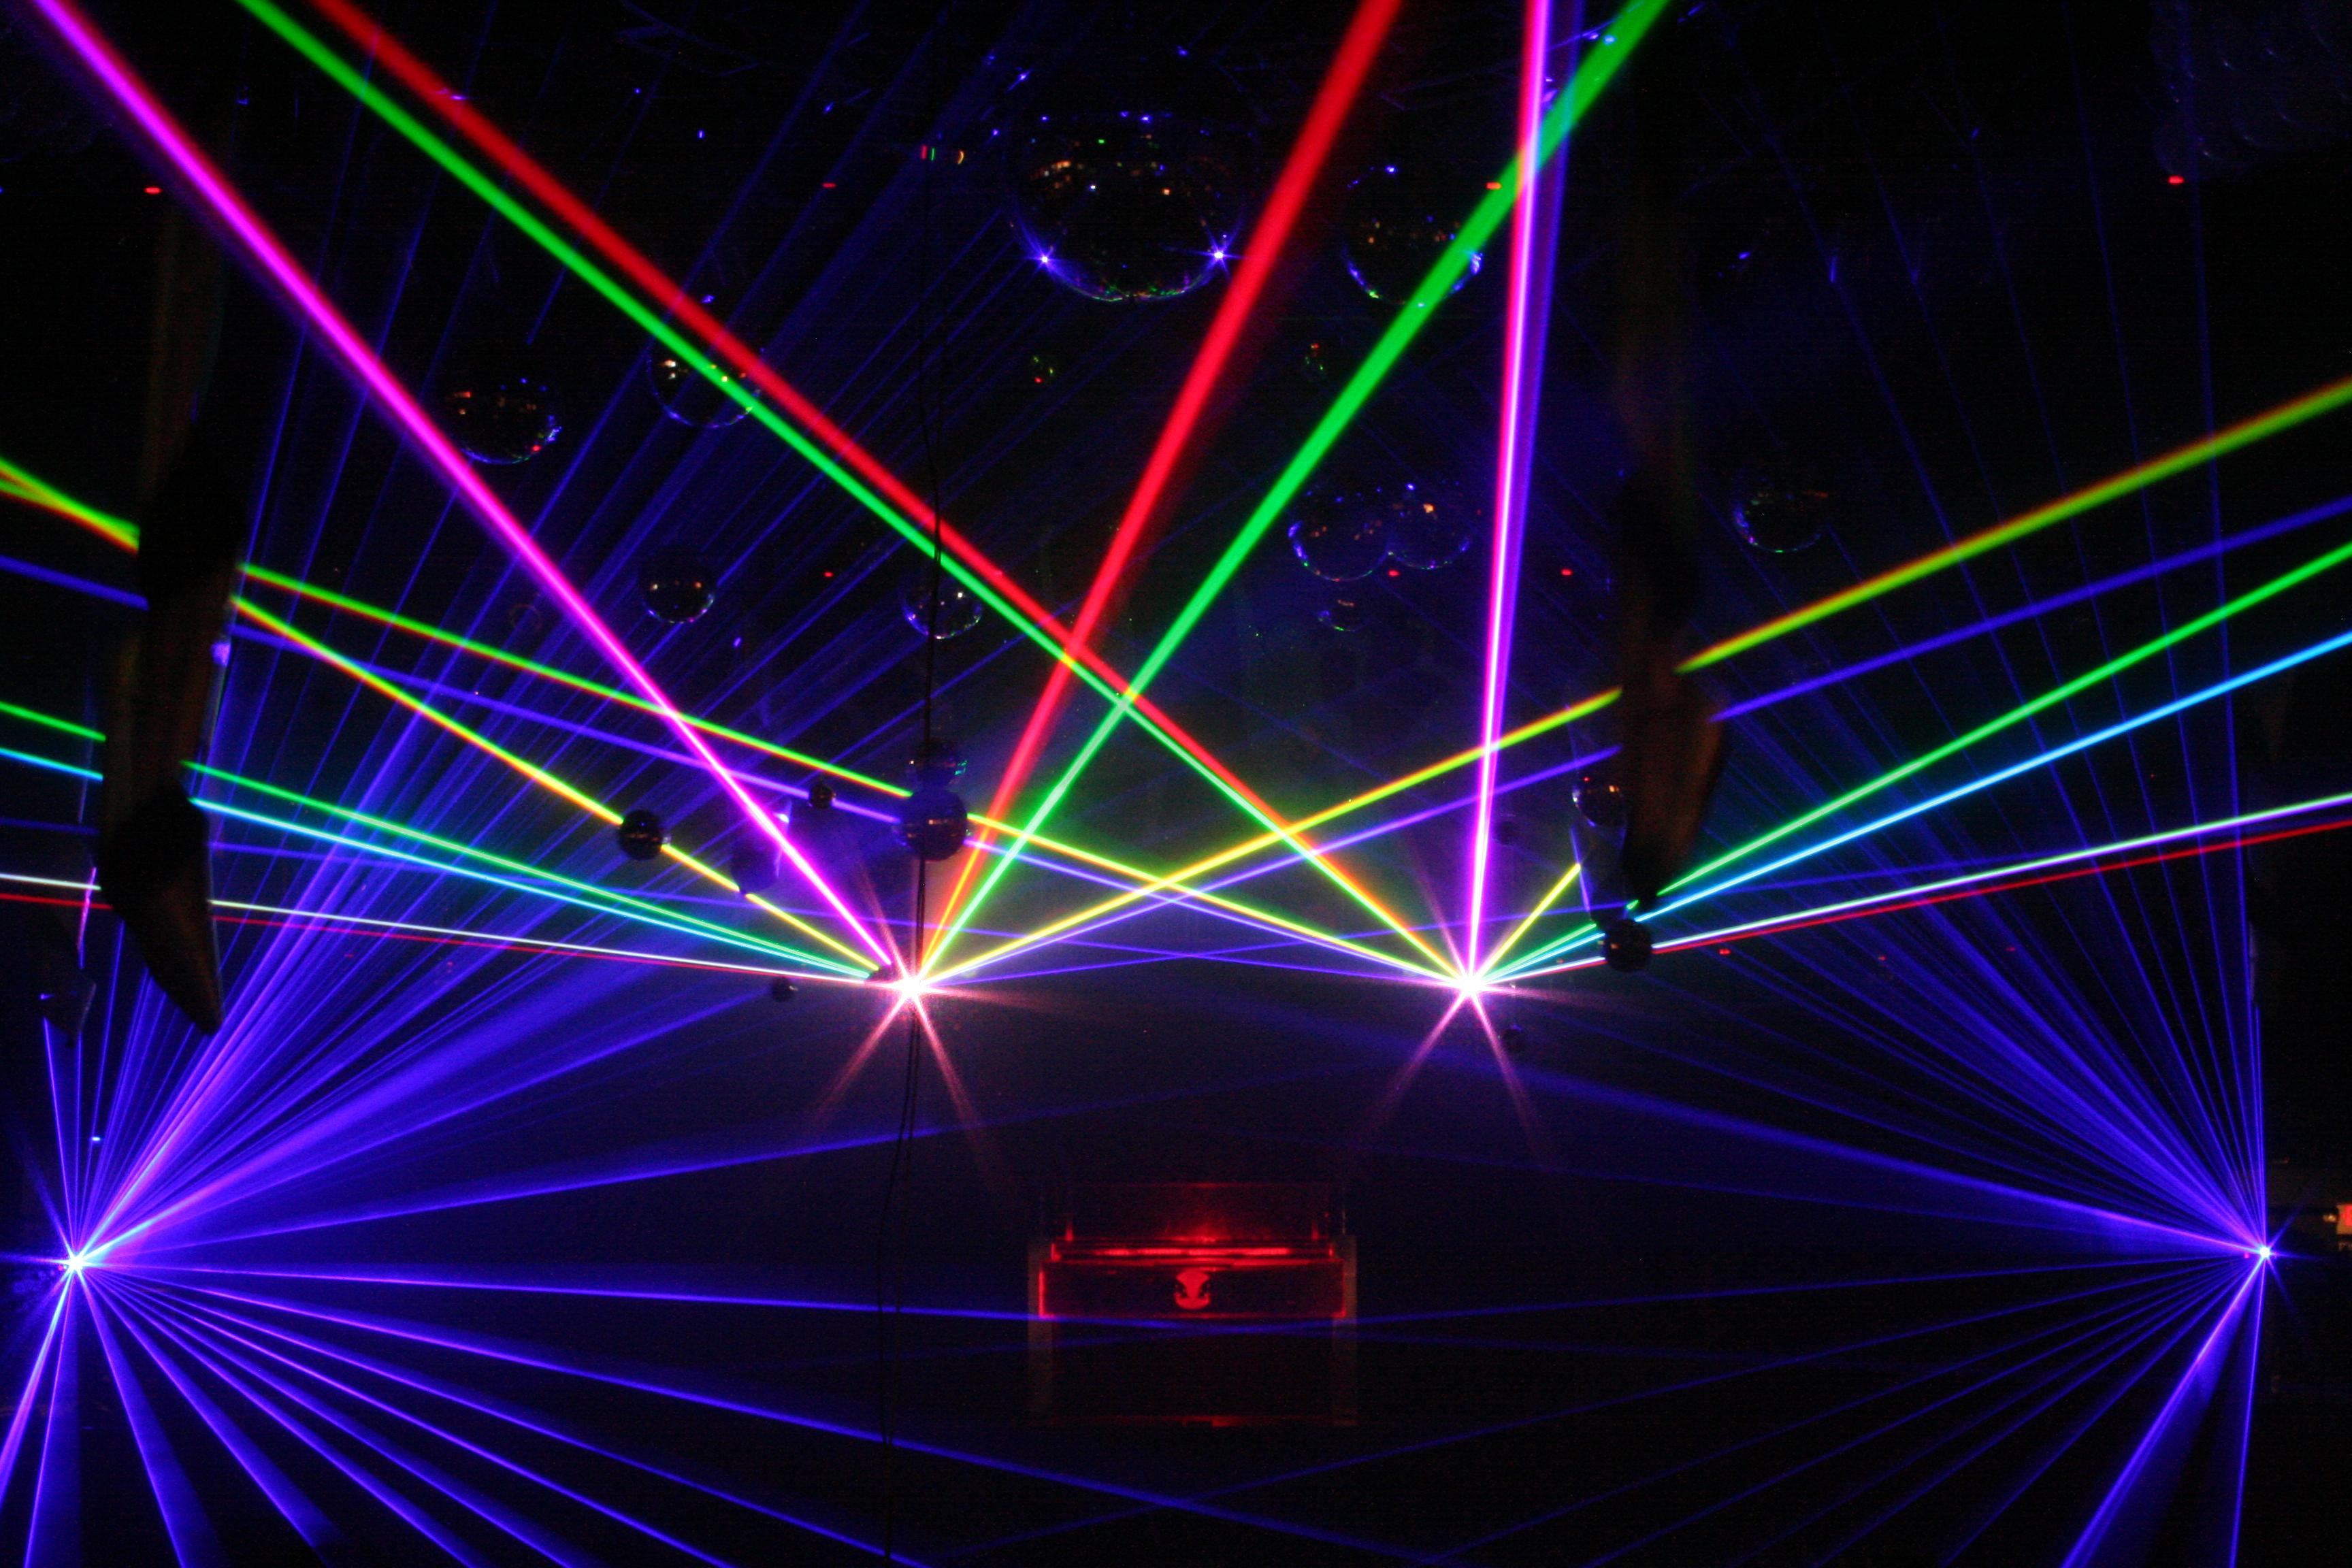 Club laser show in Hartford CT